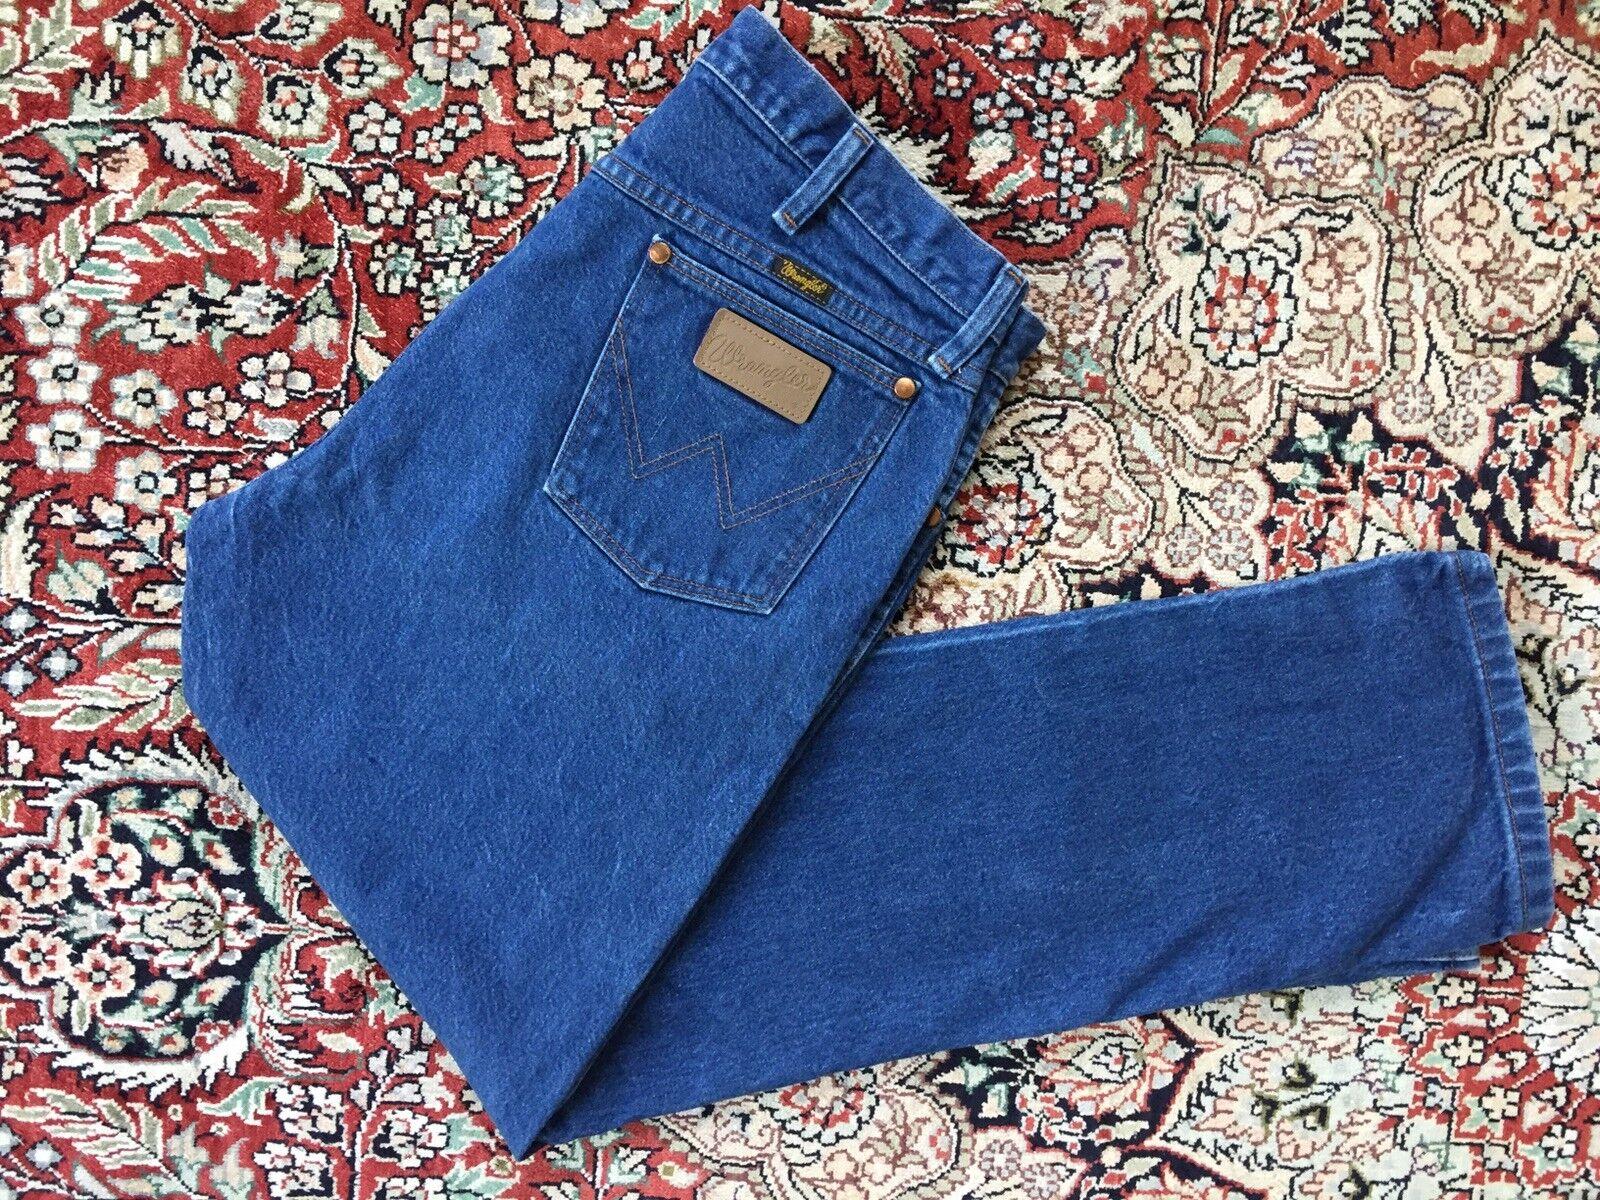 Vtg Wrangler Dark Wash Denim Jeans men's 34x30 13mwz Cowboy High Waisted 845